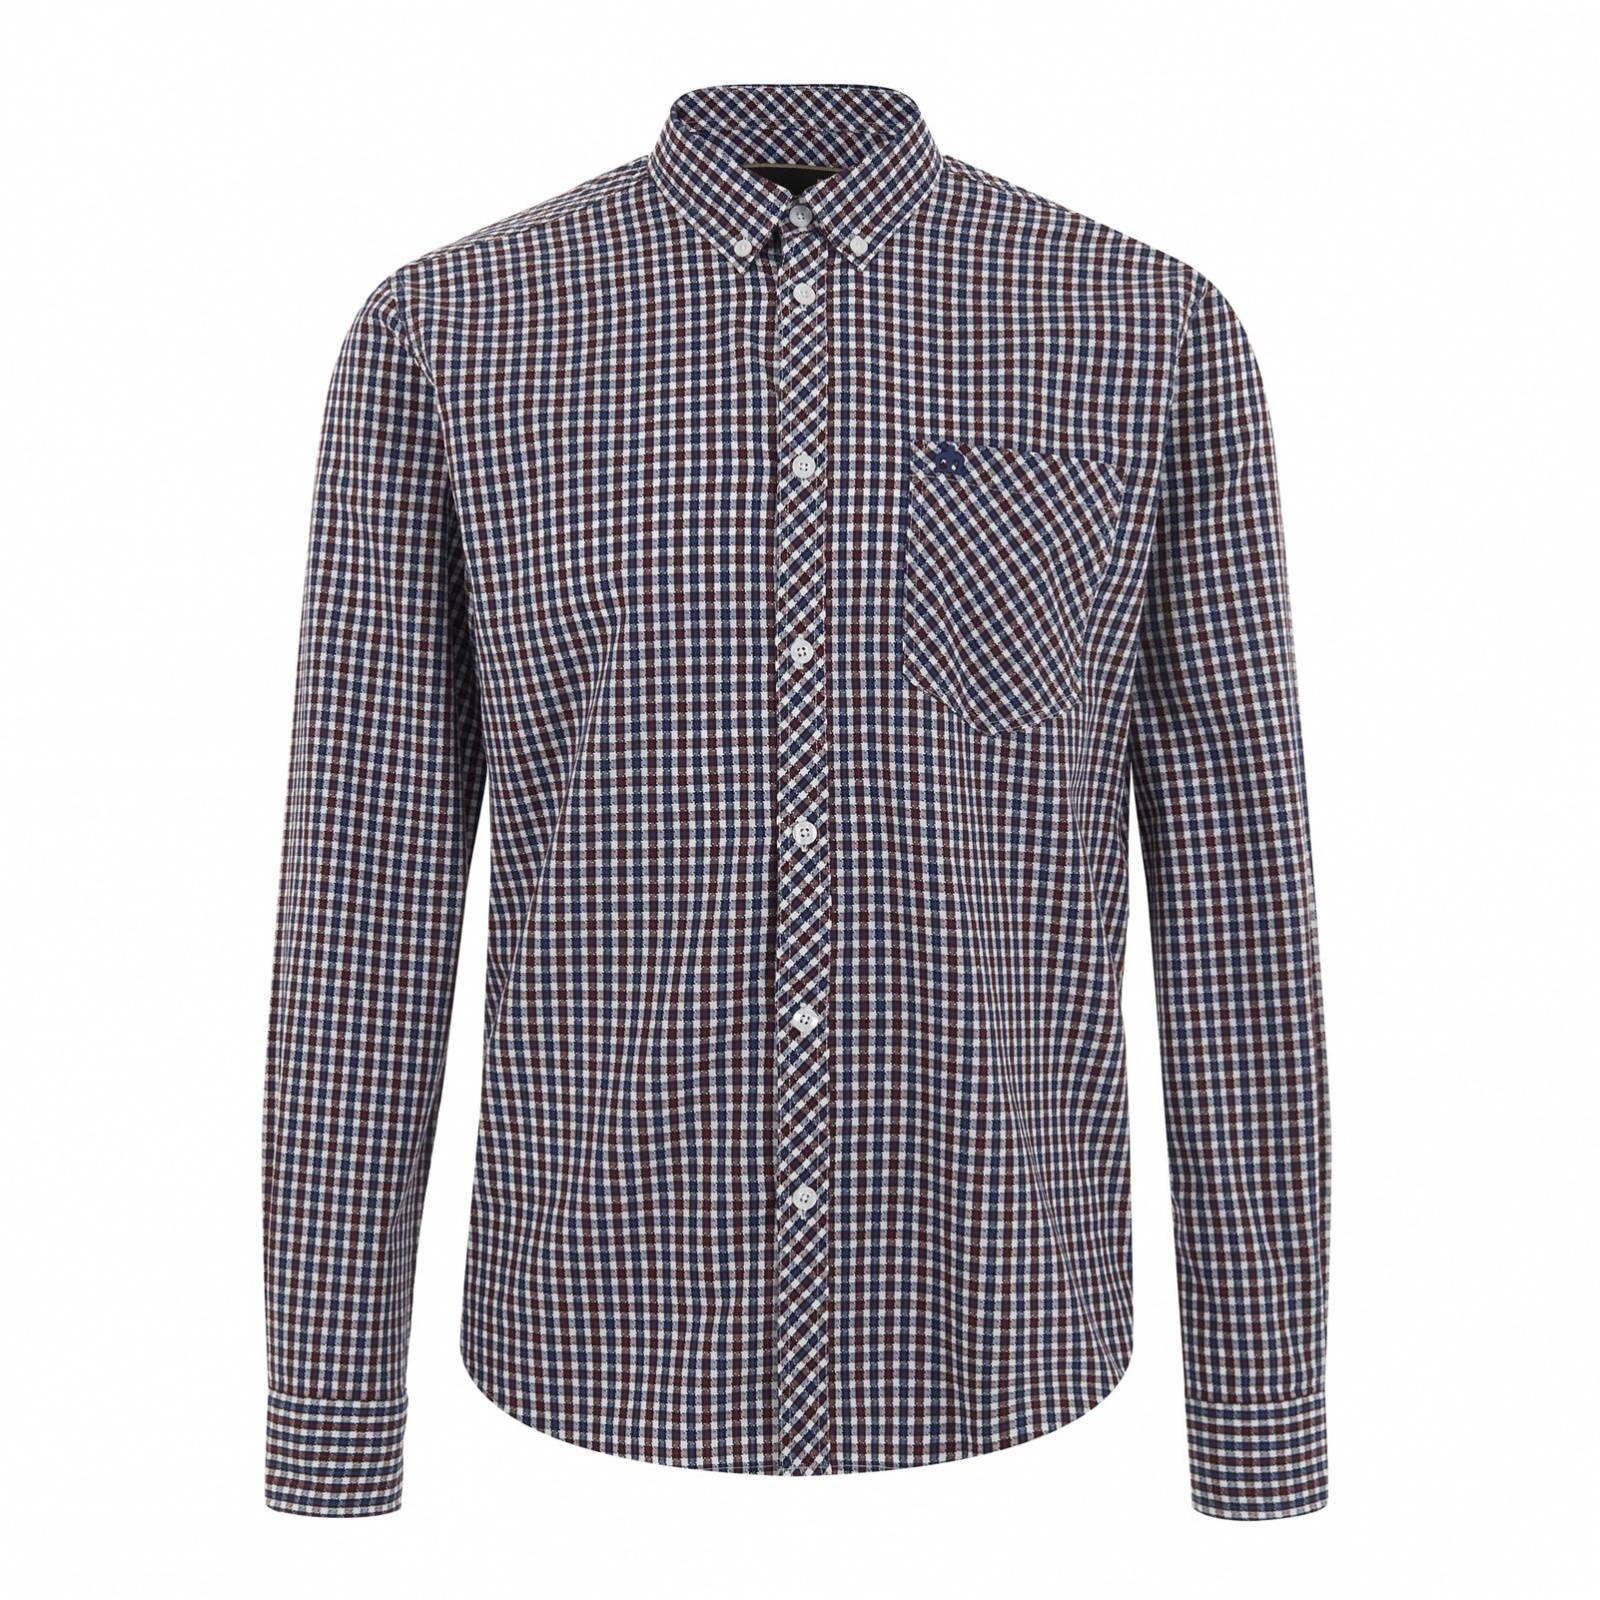 Рубашка PitmanРубашки<br><br><br>Артикул: 1515209<br>Материал: 100% хлопок<br>Цвет: красно-сине-белая клетка<br>Пол: Мужской